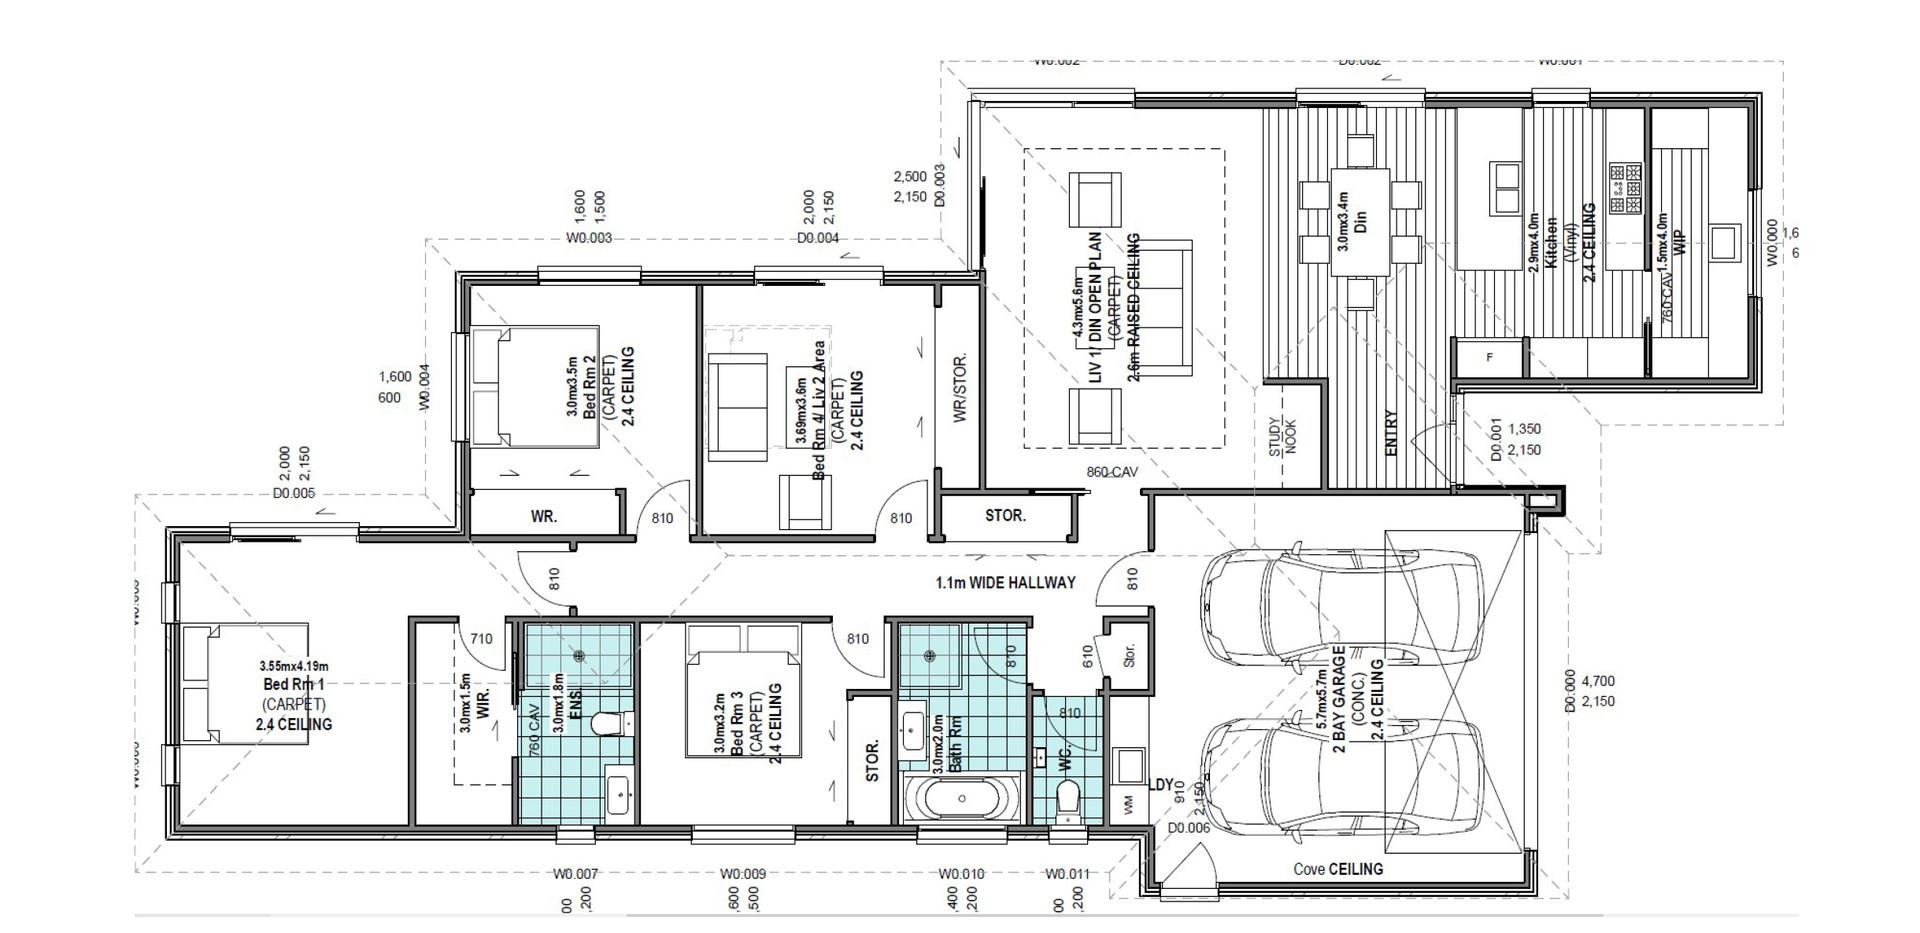 505-Falcons_Floorplan-2.jpg